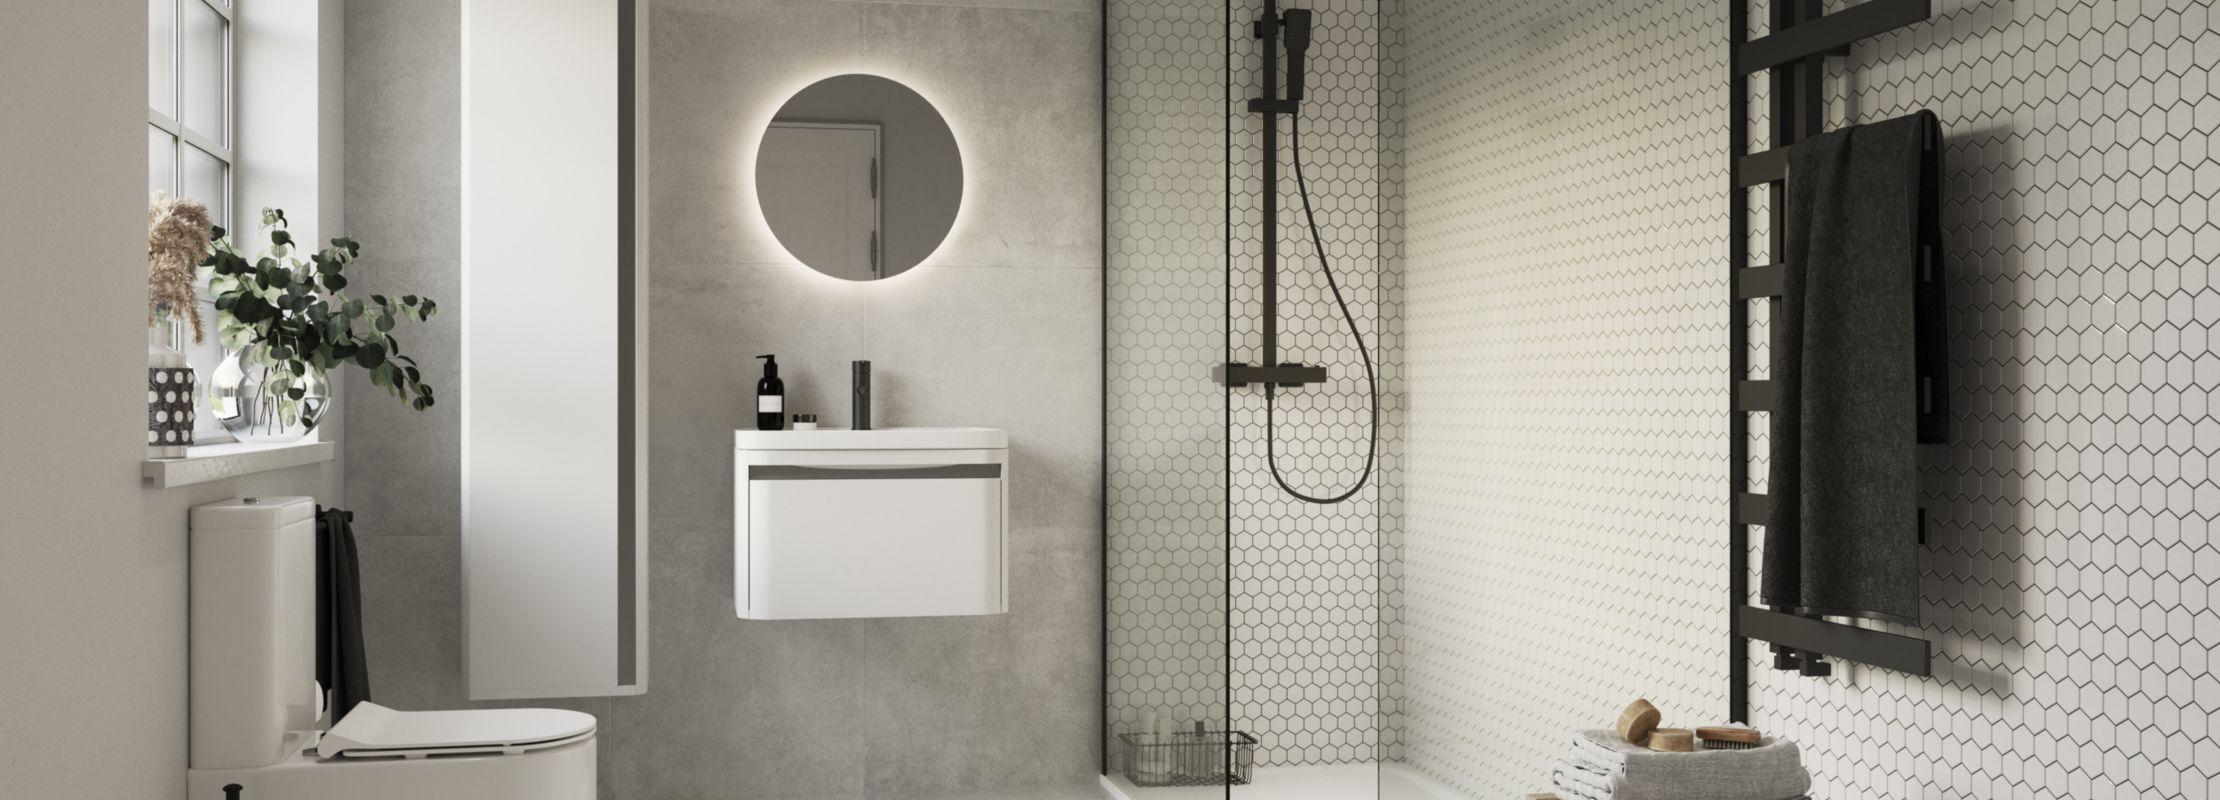 Showroom Bathroom SALE